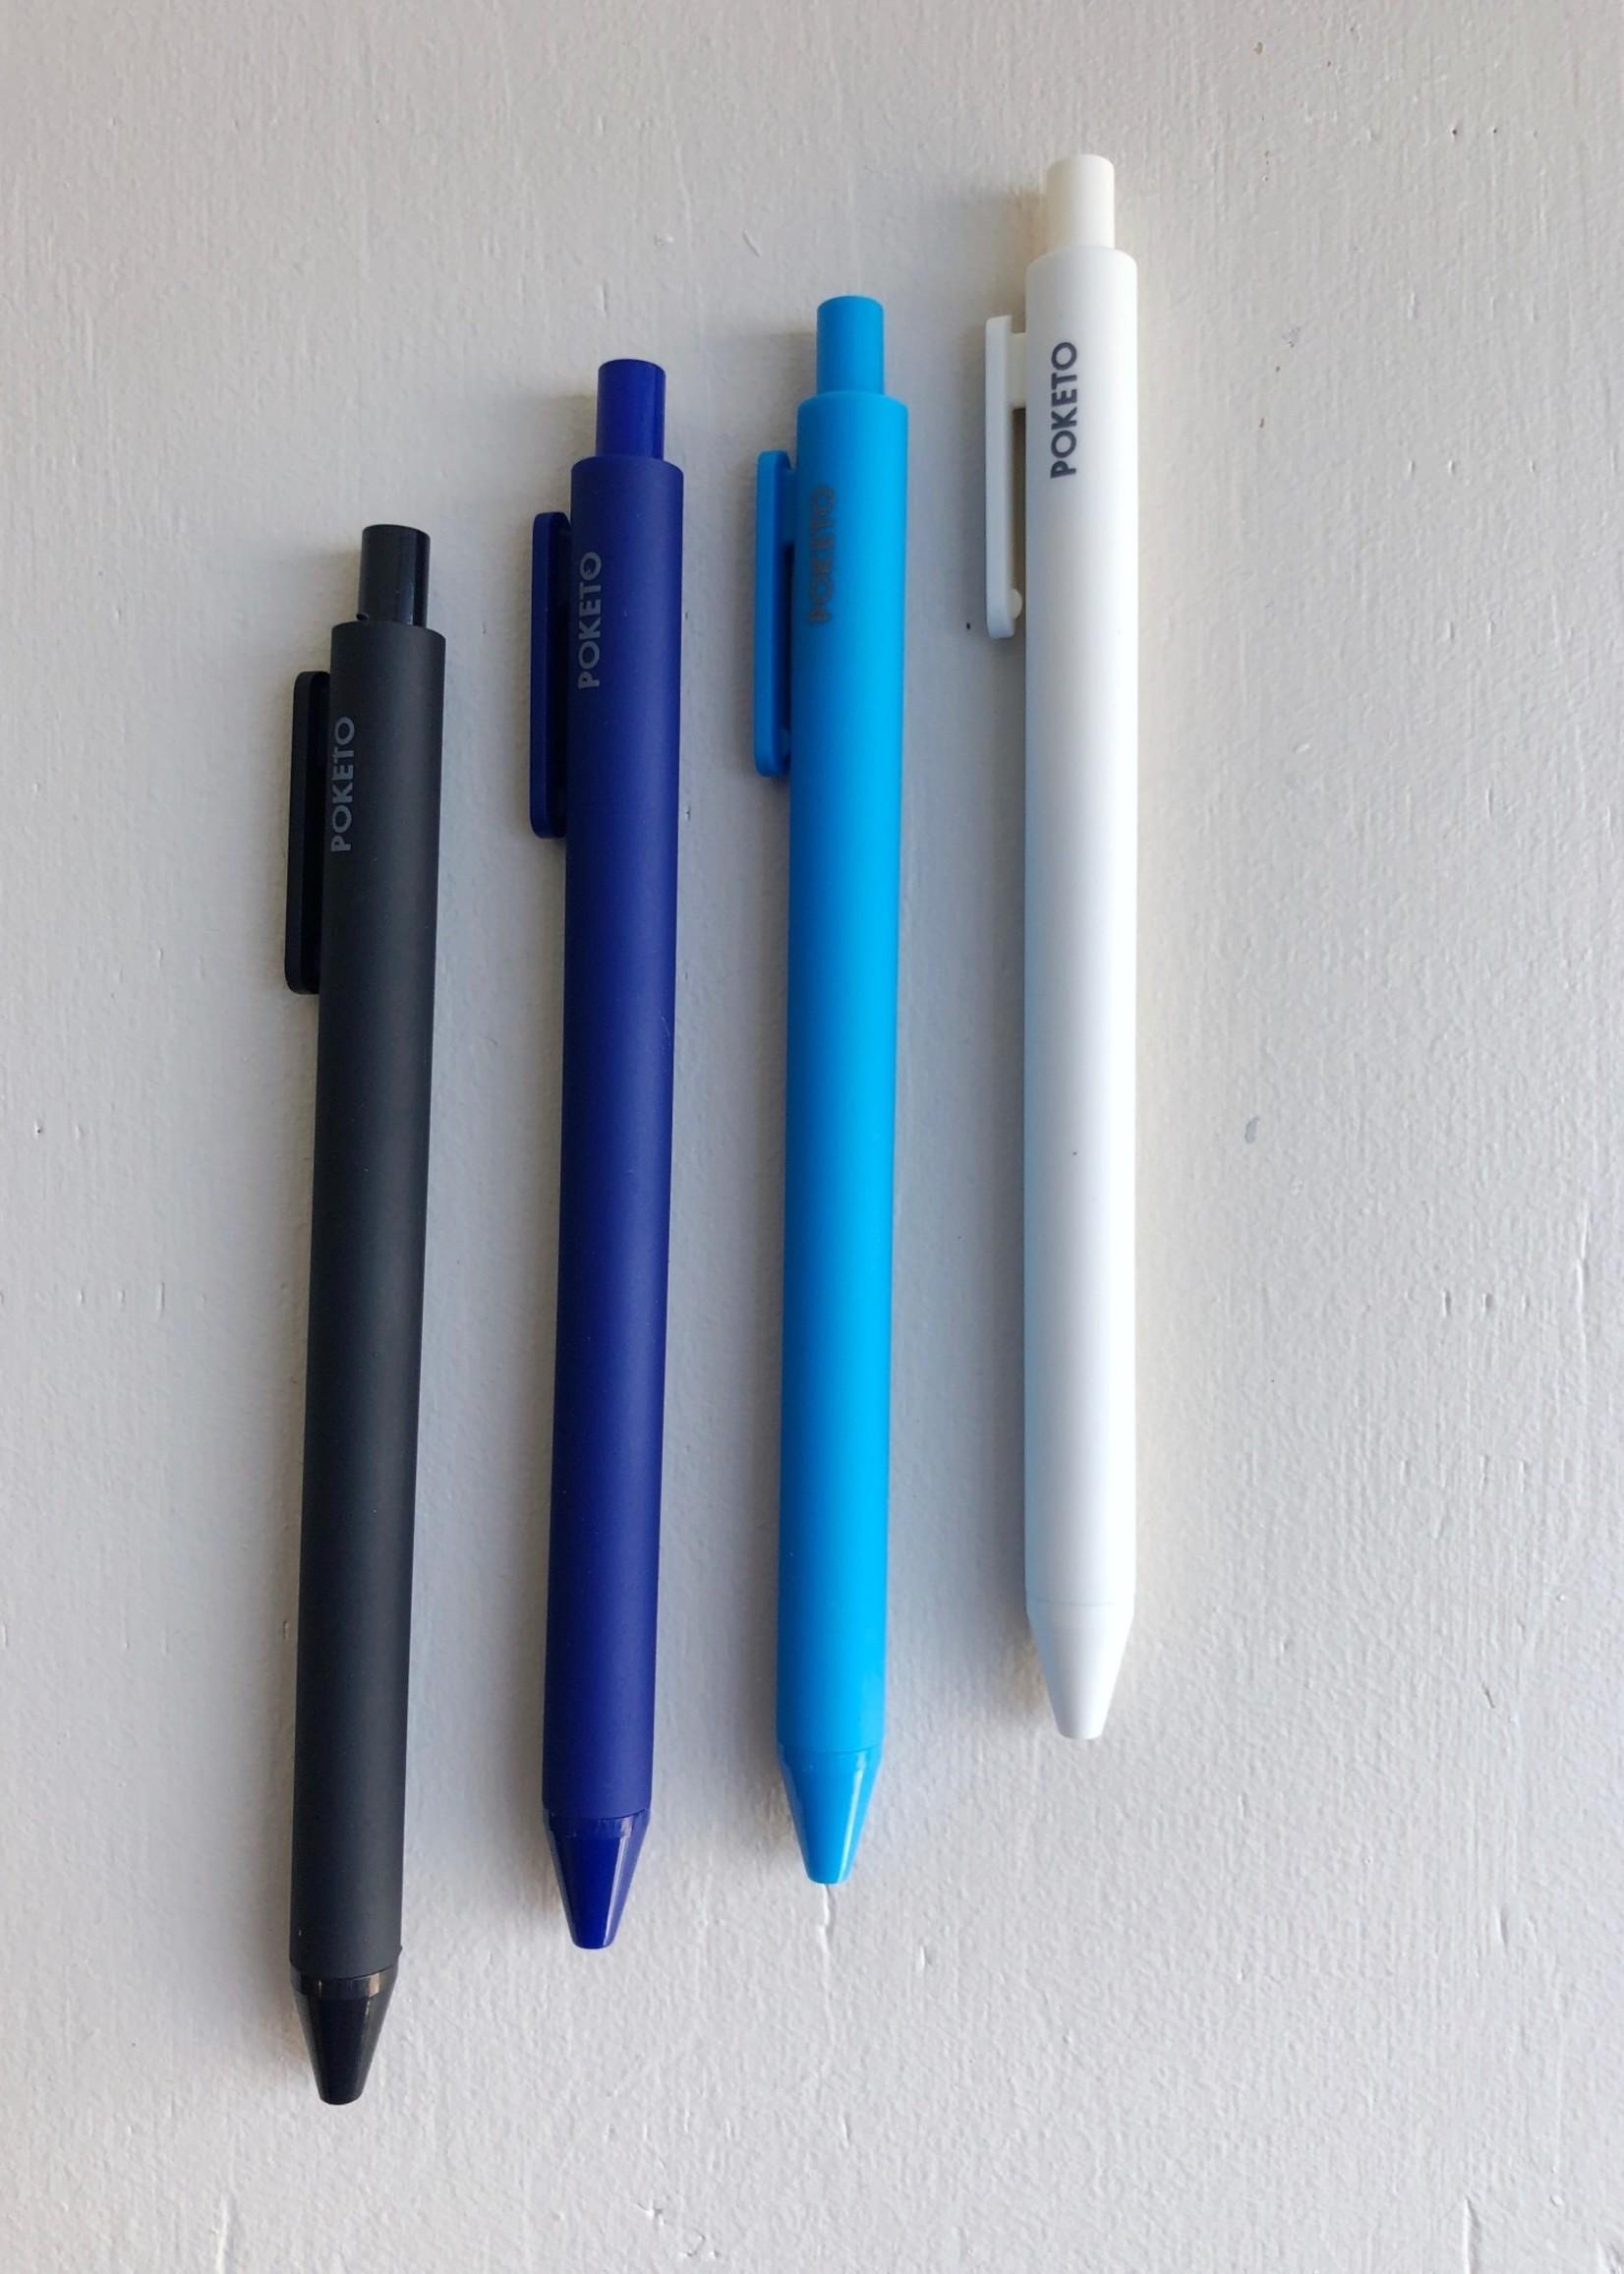 Poketo Vivid Gel Pens 4-Pack by Poketo